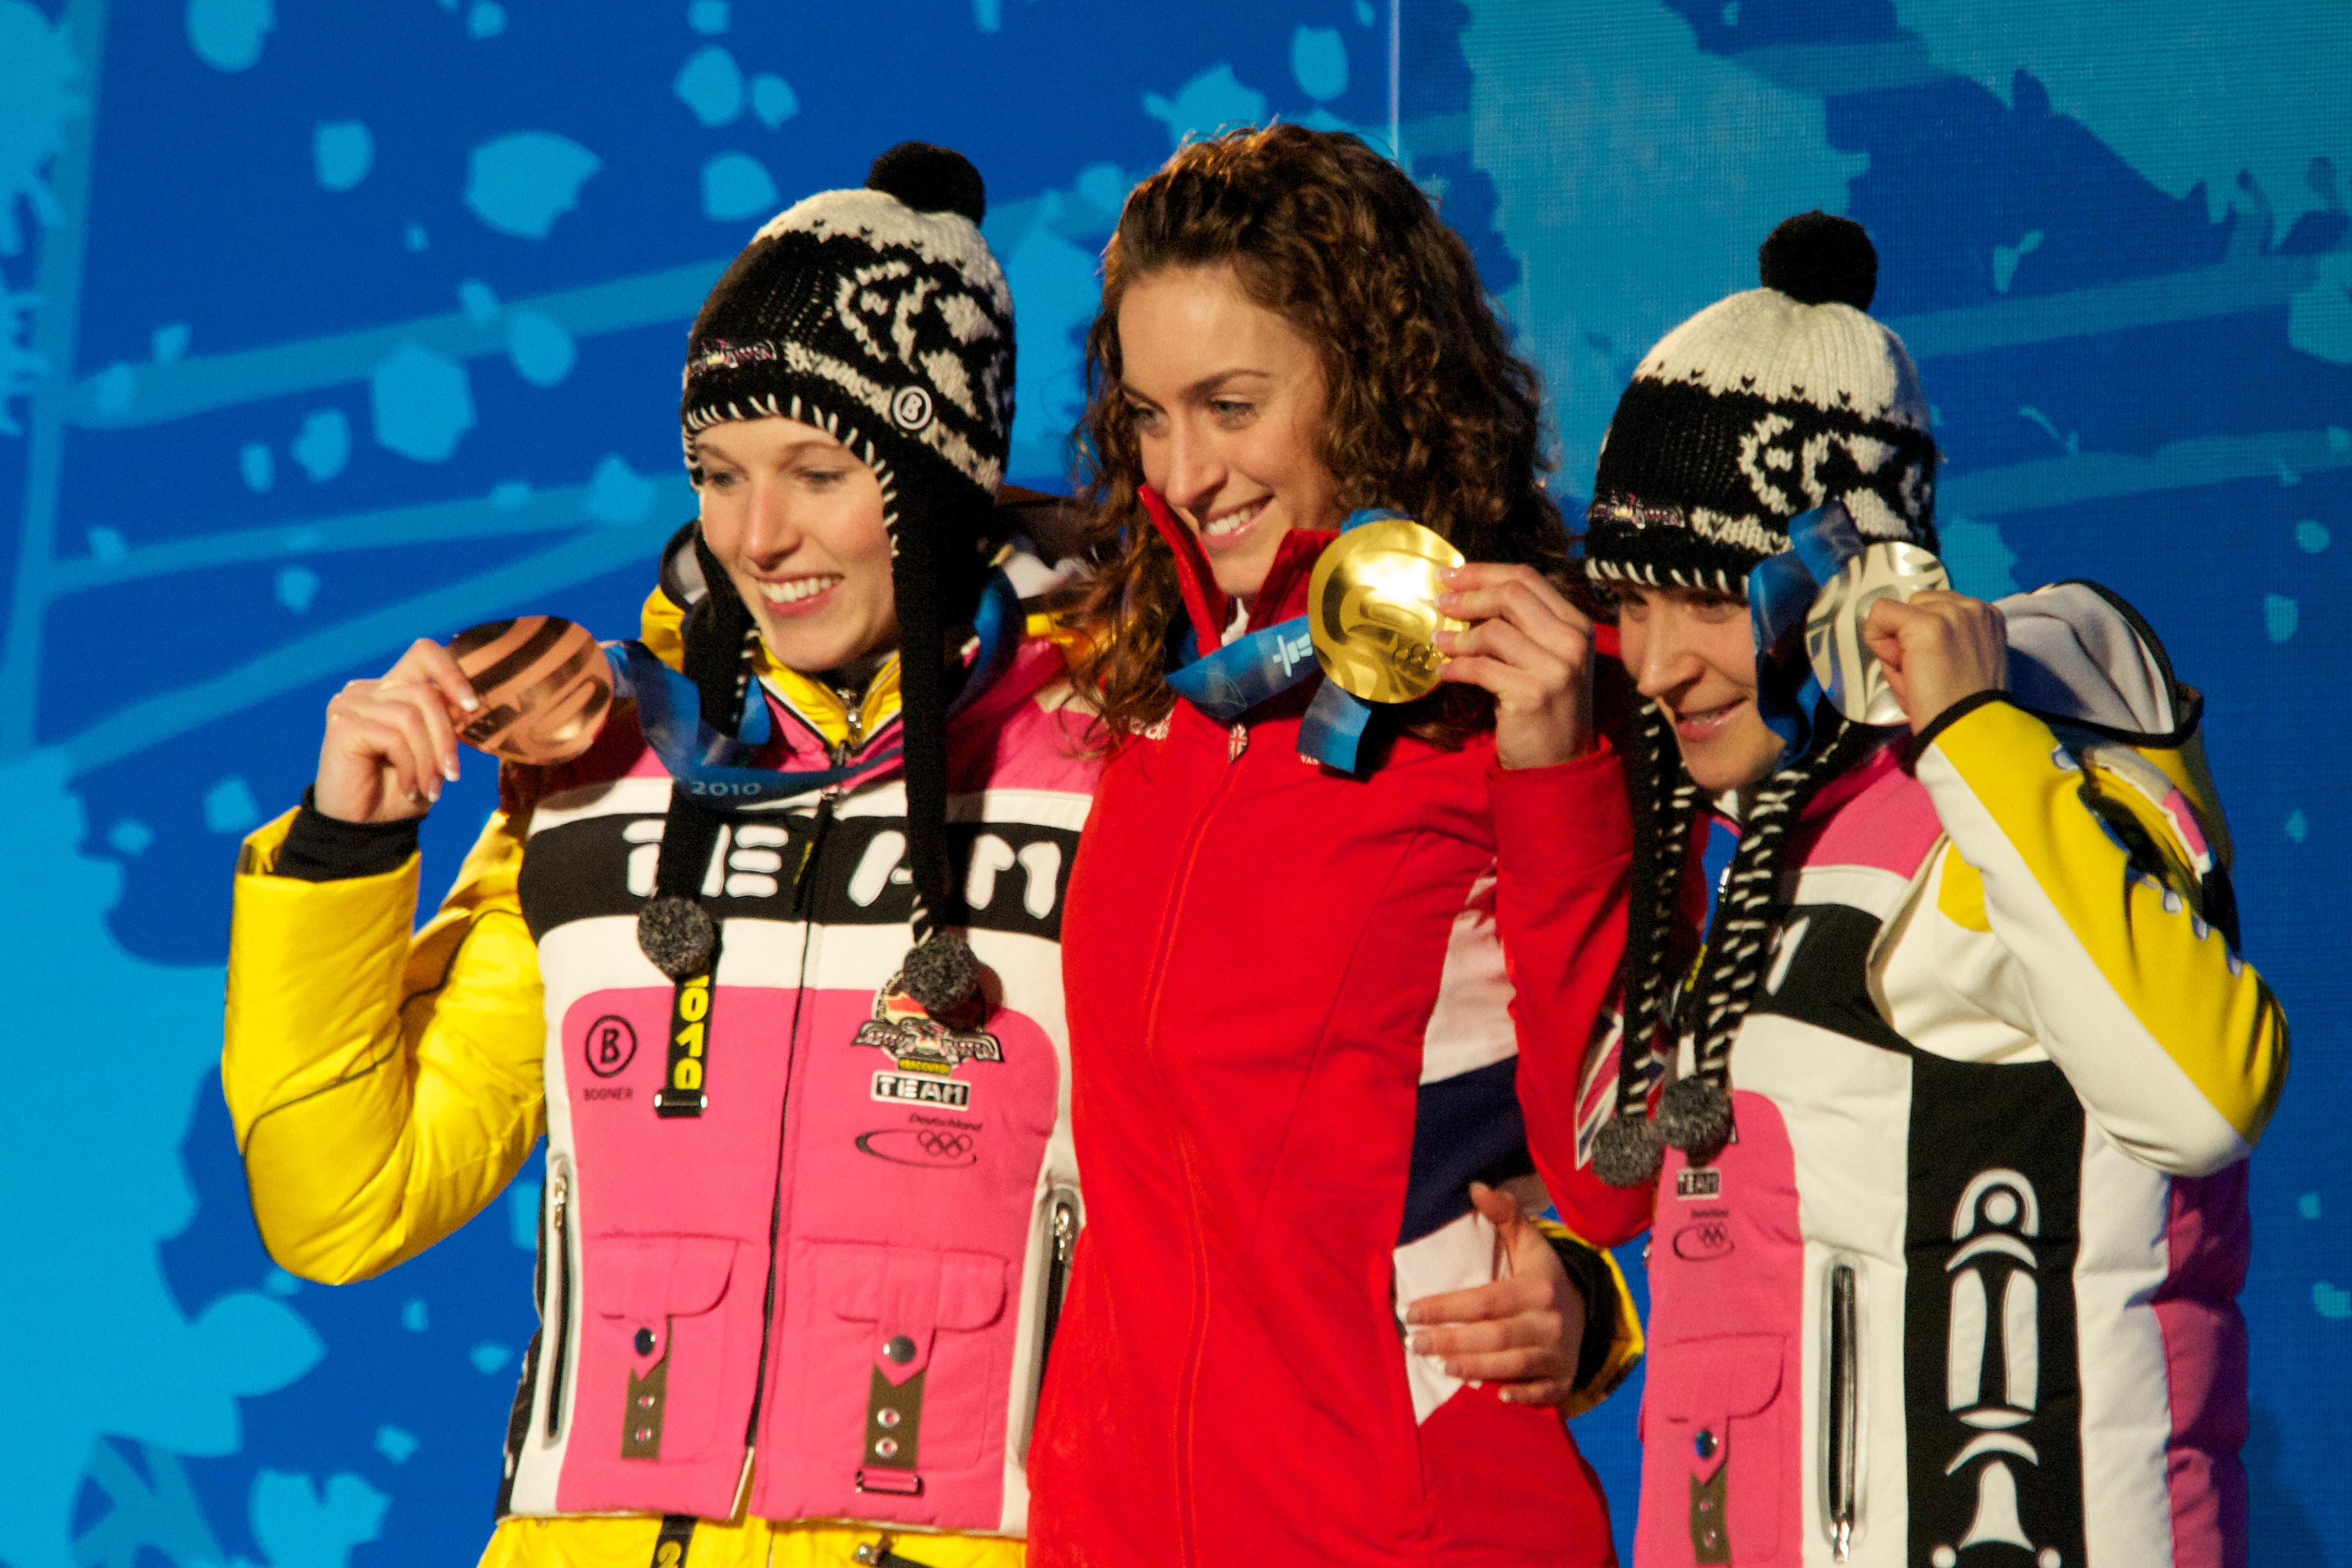 Szymkowiak (right) at the 2010 Winter Olympics women's skeleton medal ceremony